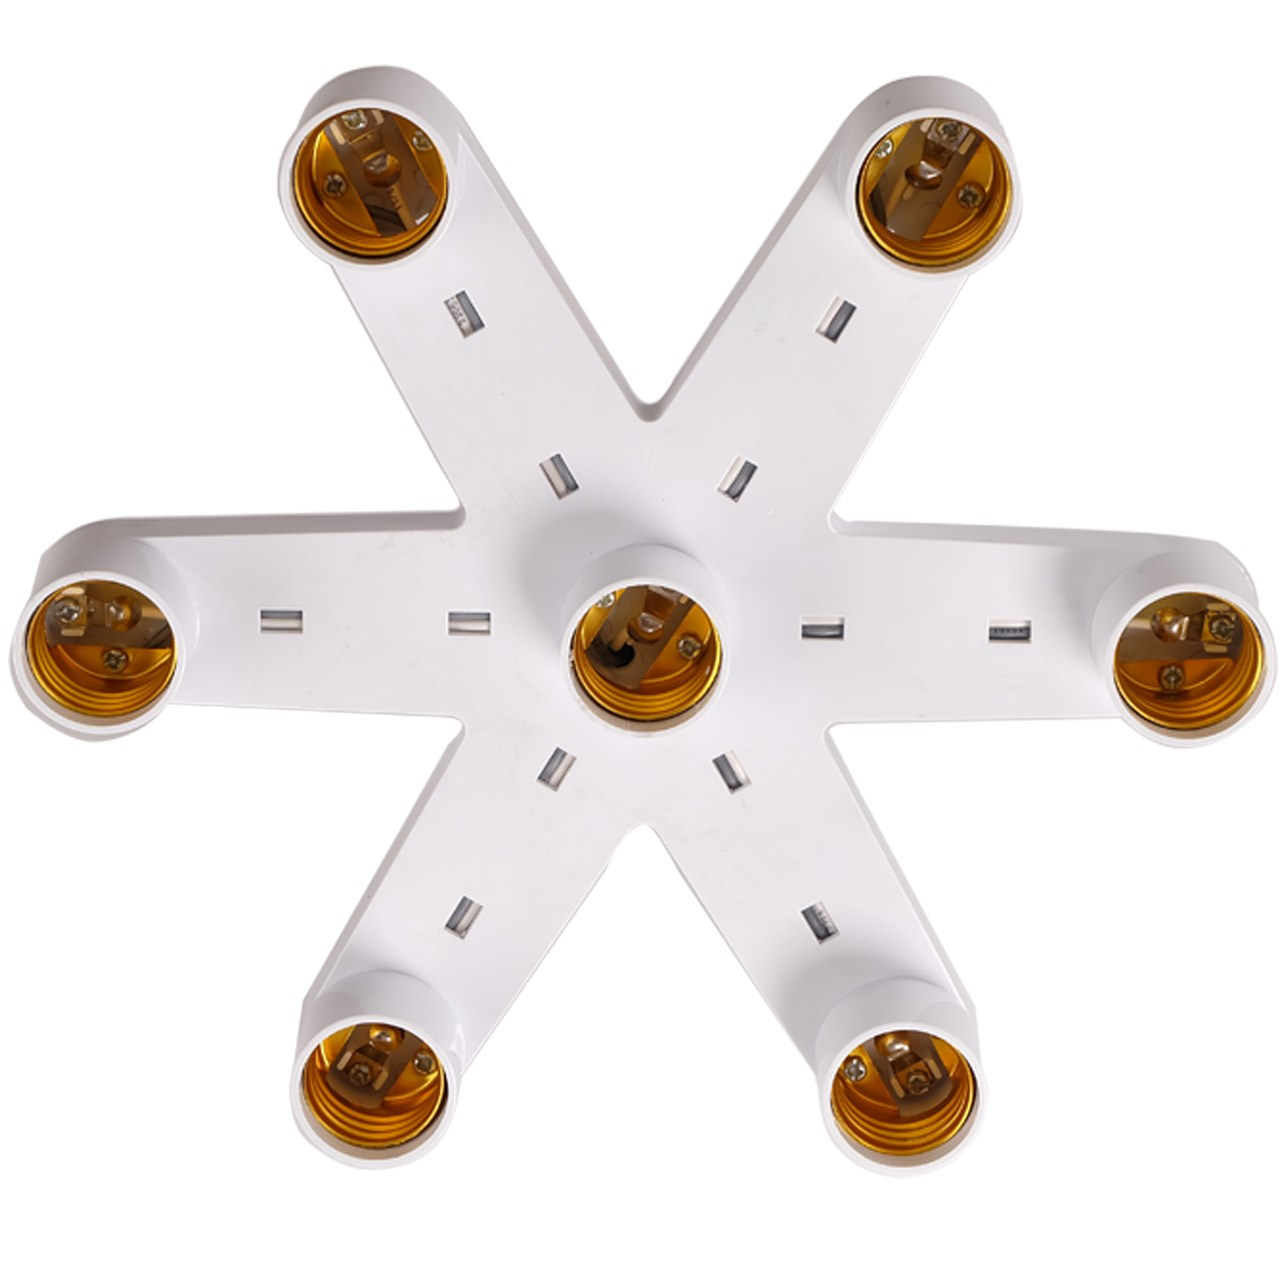 سر پیچ لامپ هامان مدل 7To1